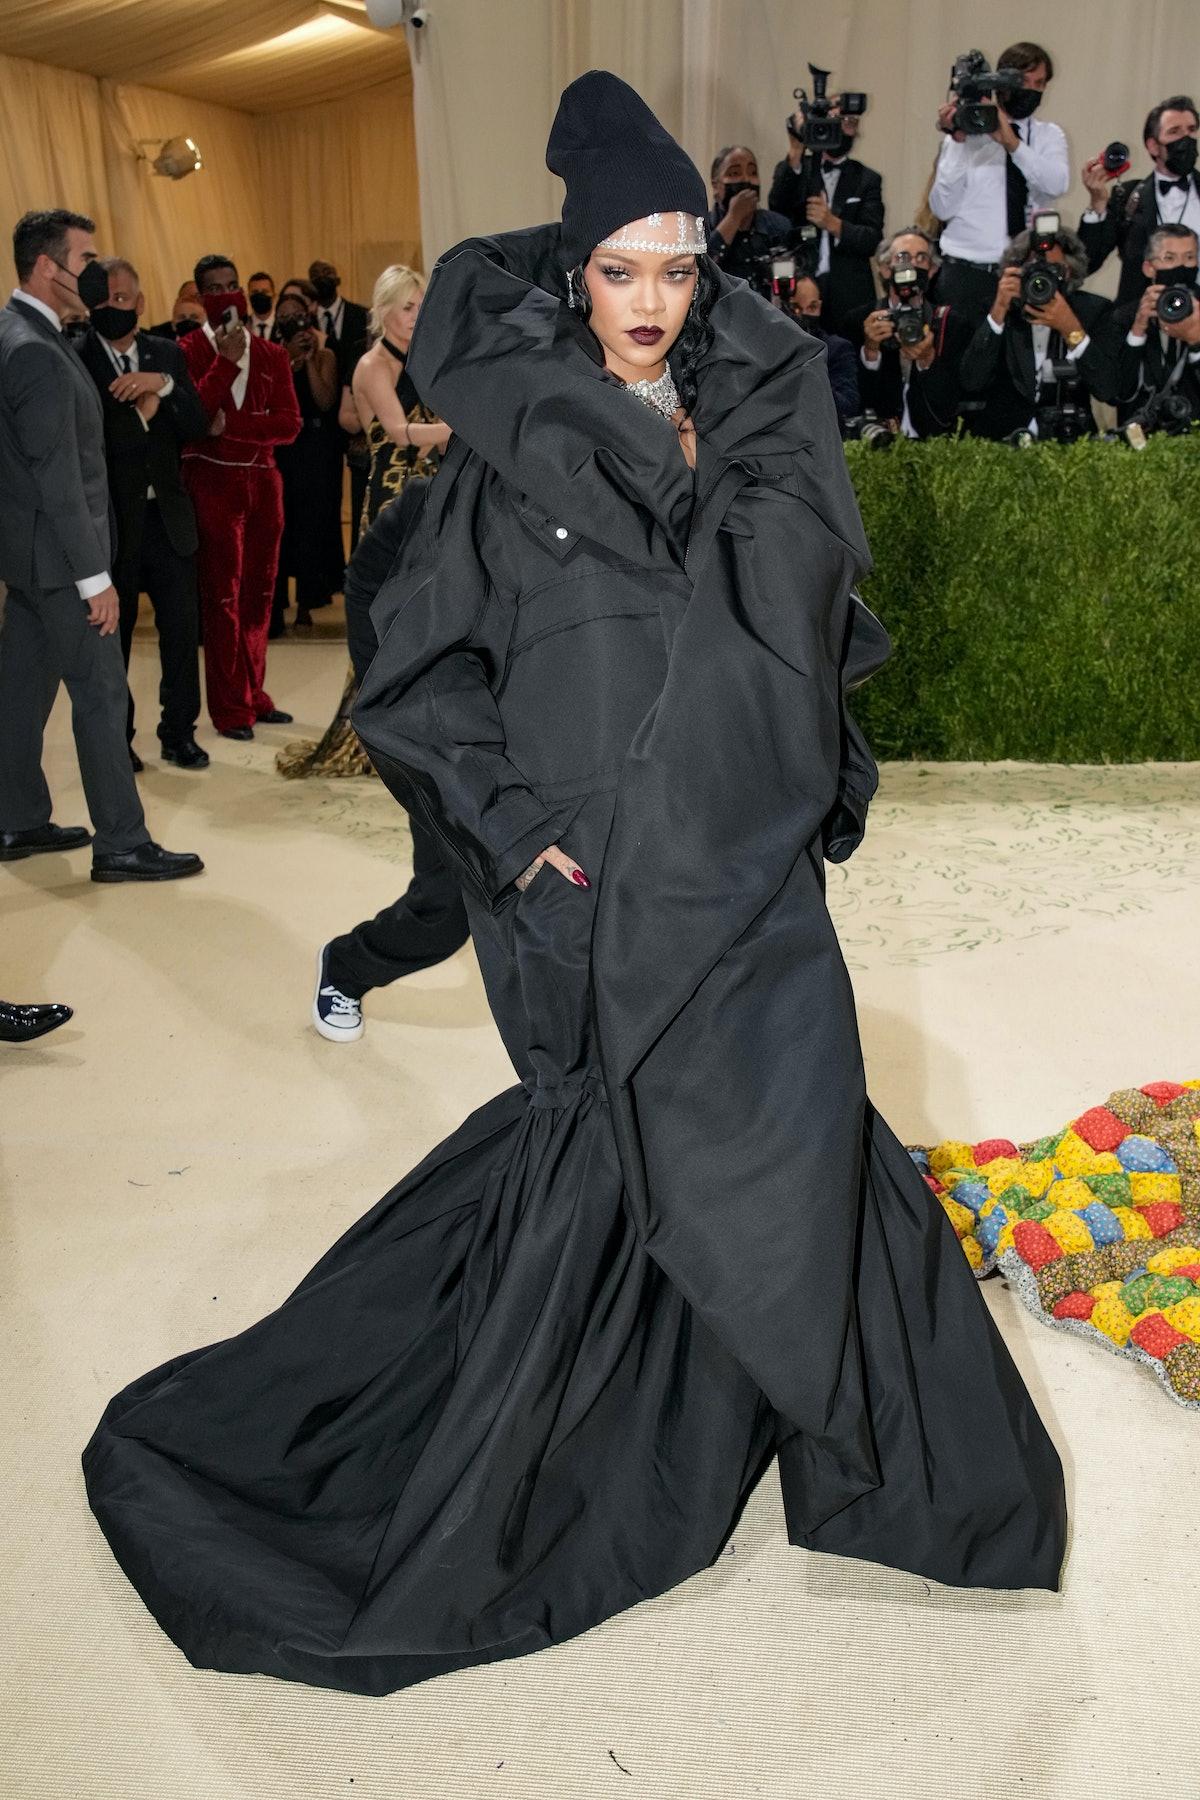 NEW YORK, NEW YORK - SEPTEMBER 13: Rihanna attends The 2021 Met Gala Celebrating In America: A Lexic...